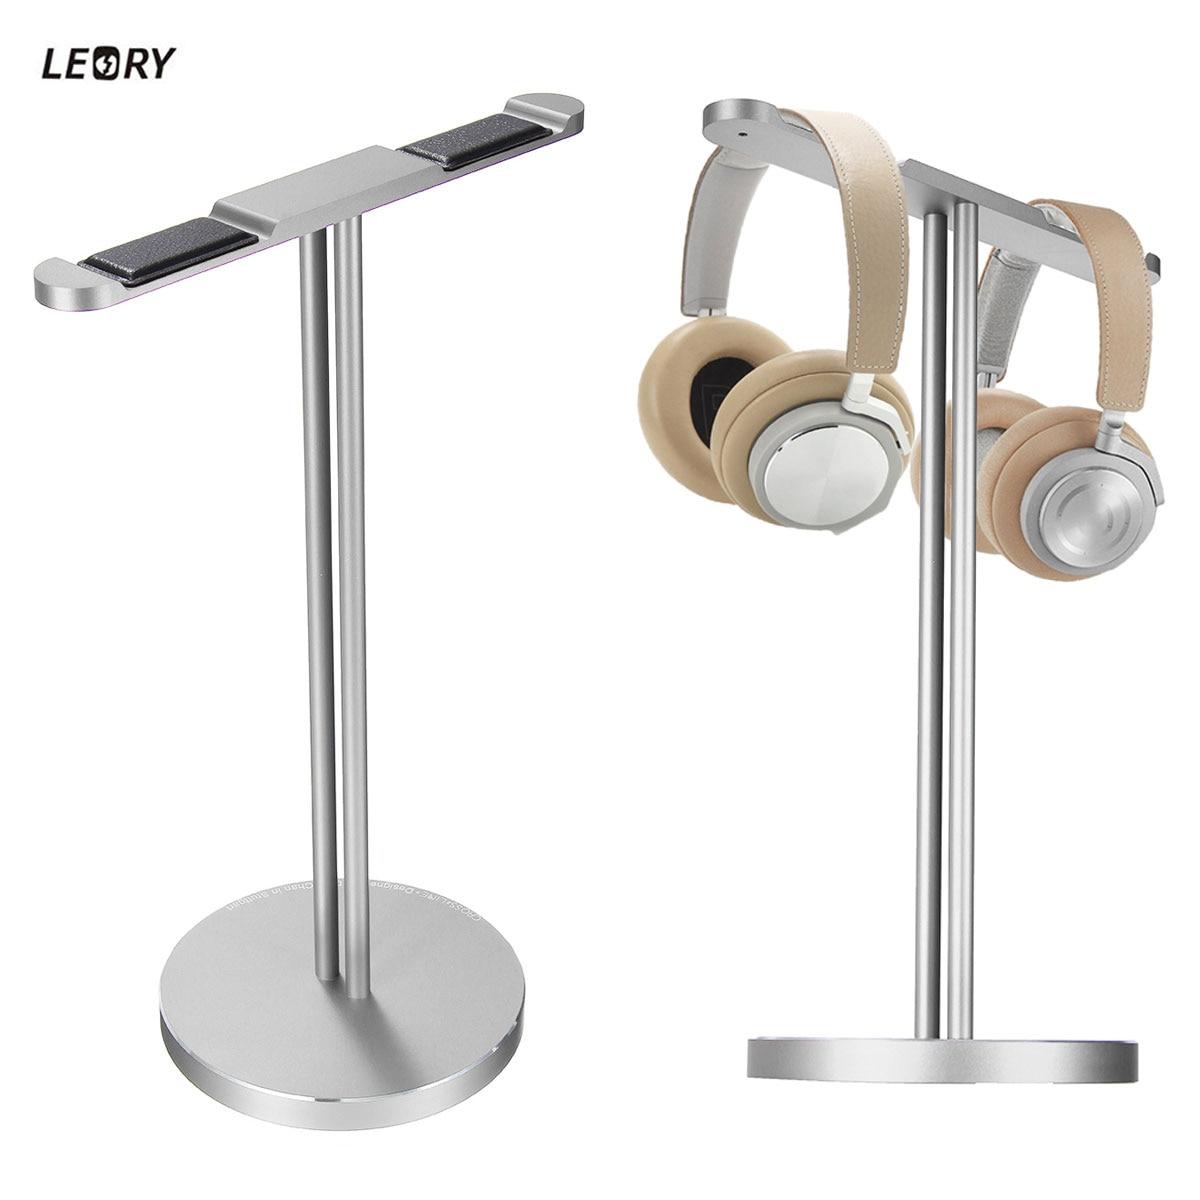 цена на Original LEORY Aluminum Headphone Headset Holder Stand Dual Hanger Holder Earphone Desk Display Rack Stand For Game Headphones